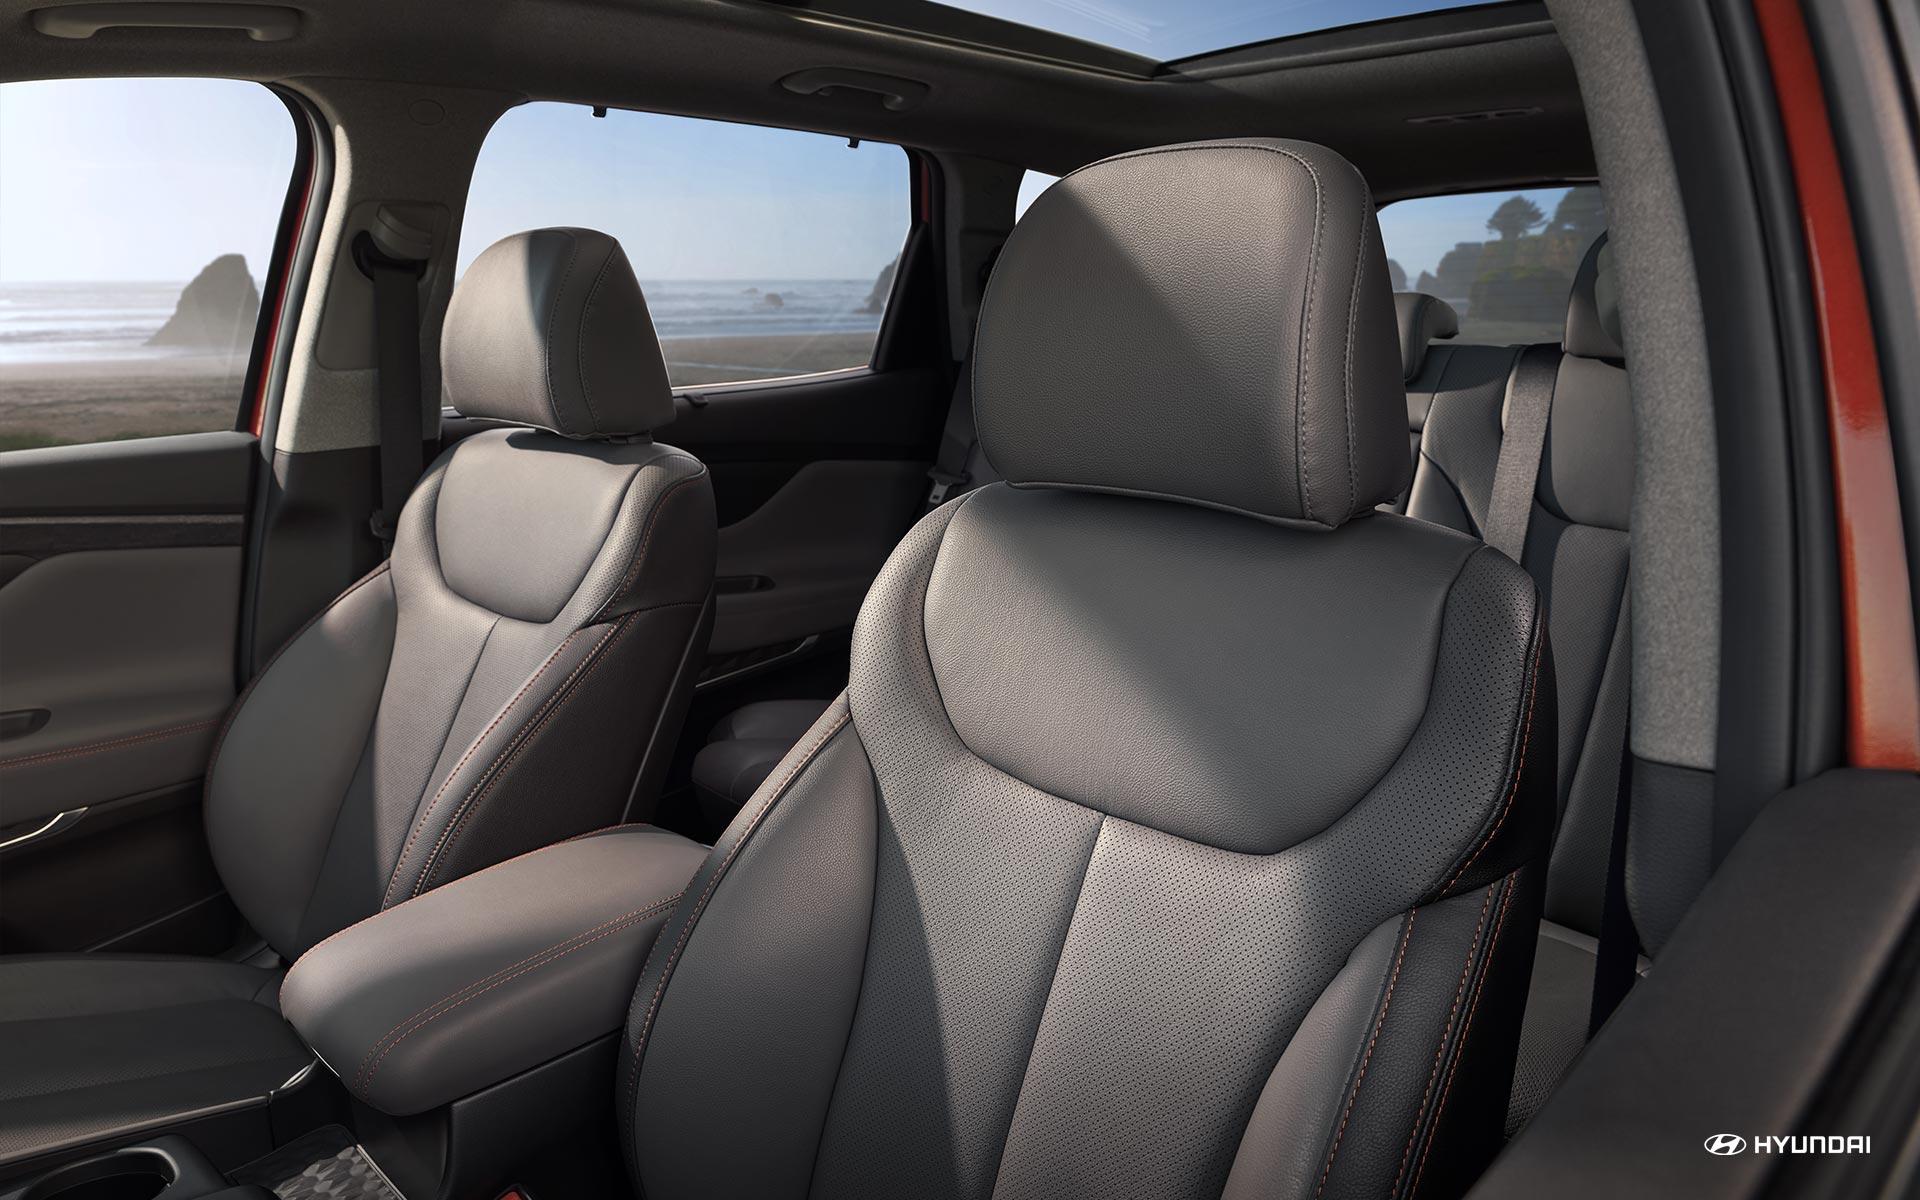 2020 Hyundai Santa Fe For Sale near Orlando, FL